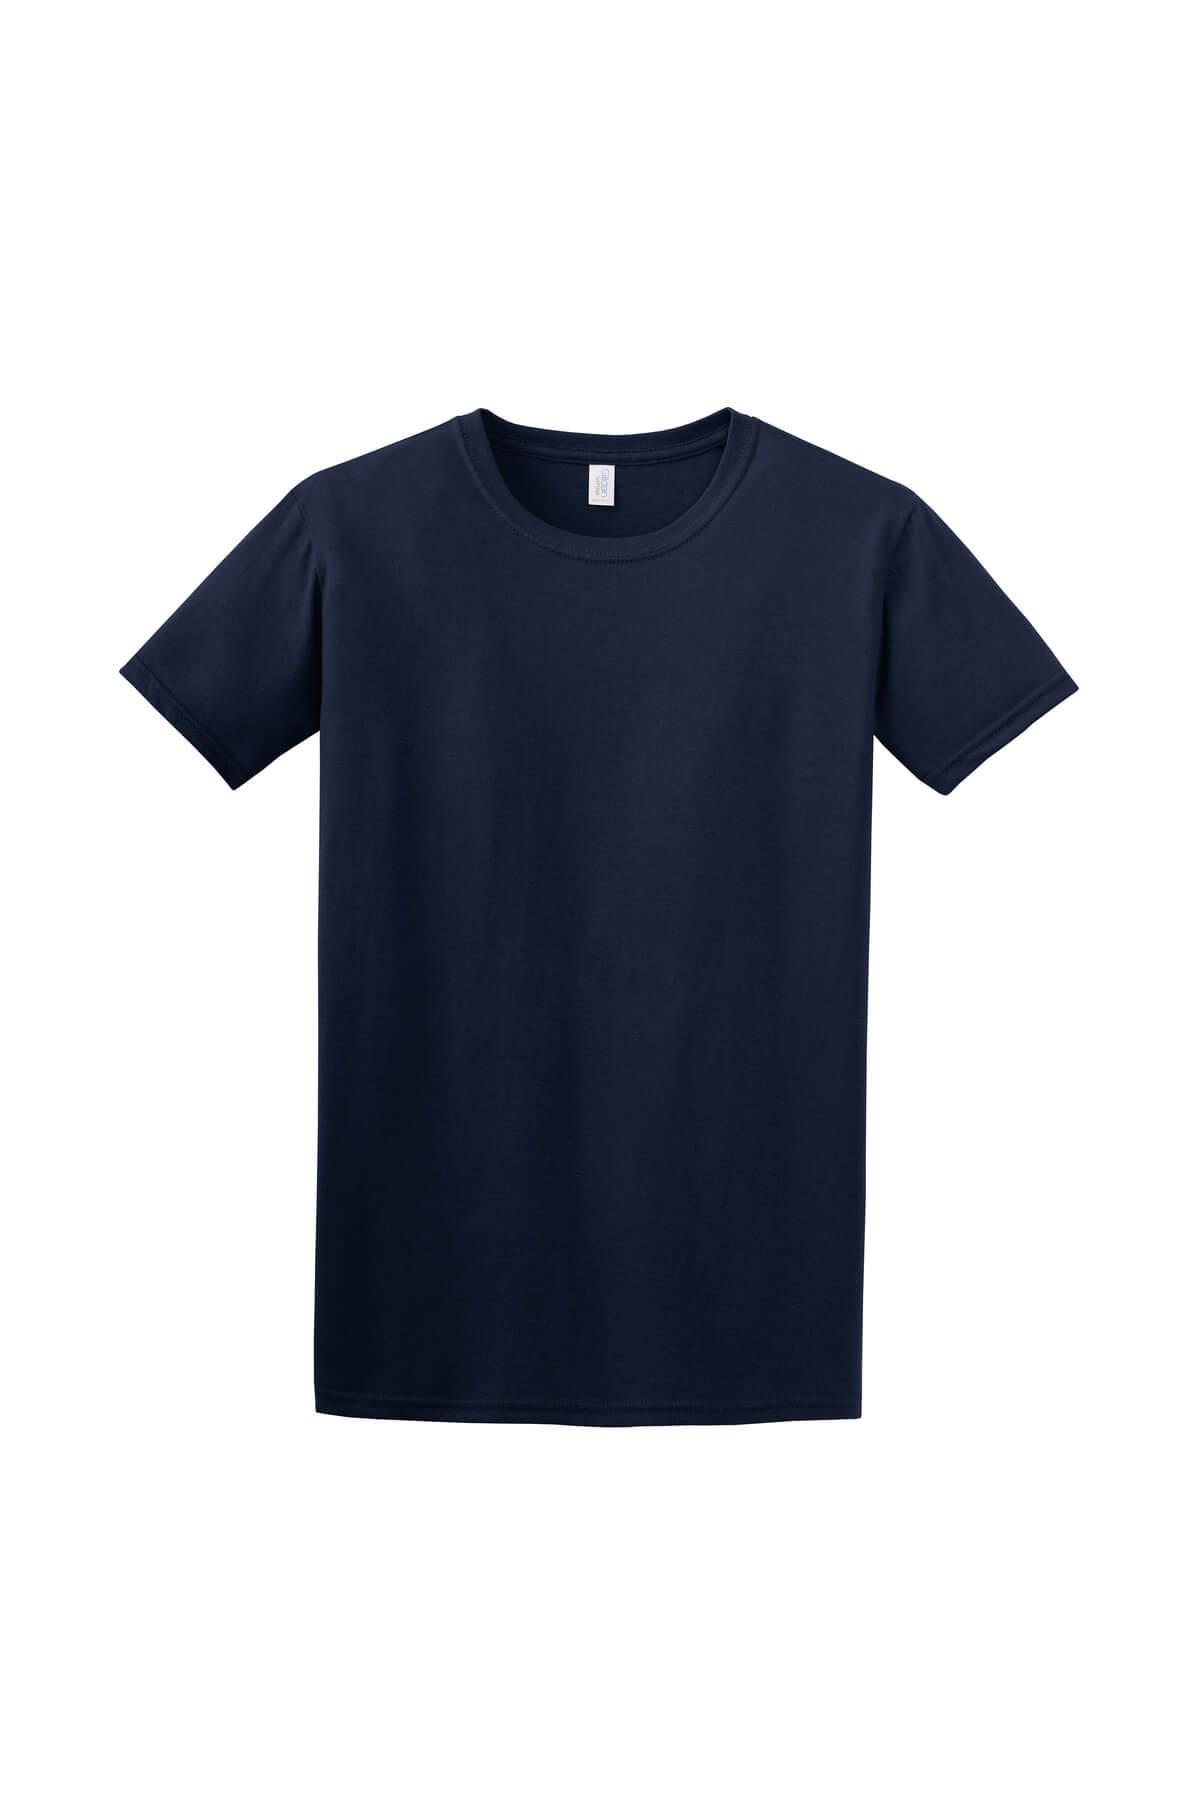 Navy T-Shirt Front